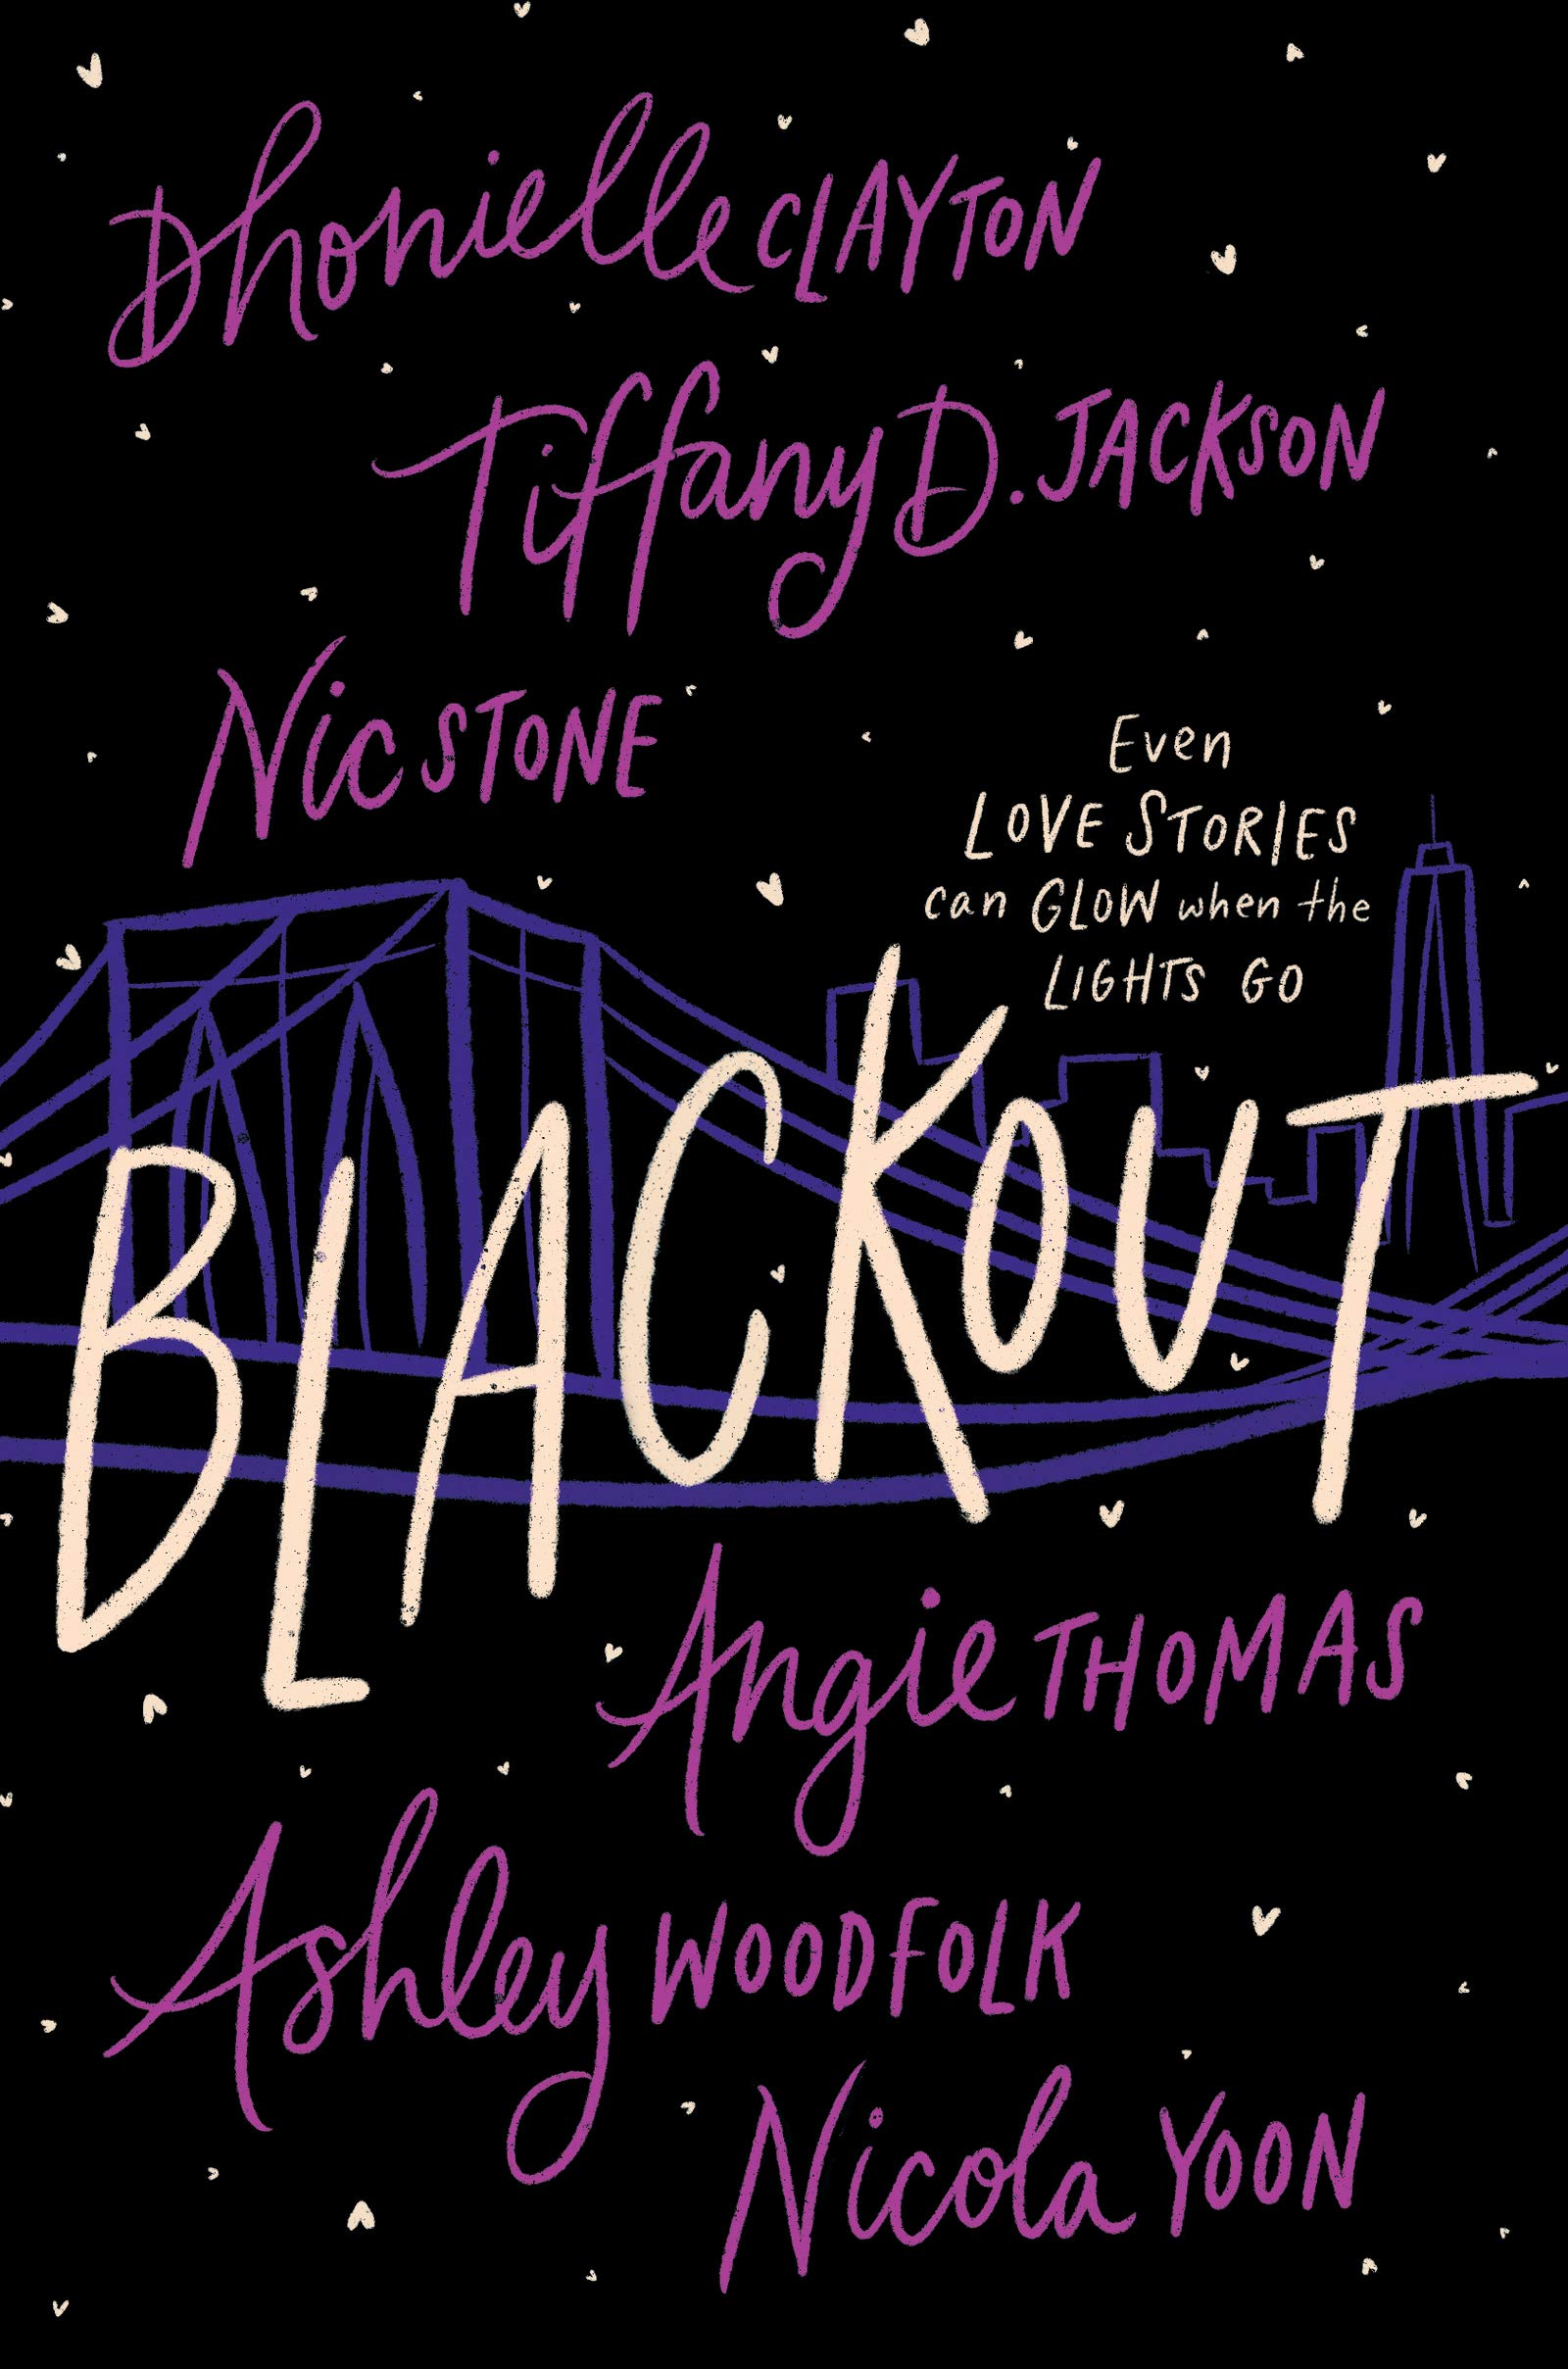 Blackout by Tiffany D. Jackson, Dhonielle Clayton, Nic Stone, Nicola Yoon, Angie Thomas, Ashley Woodfolk